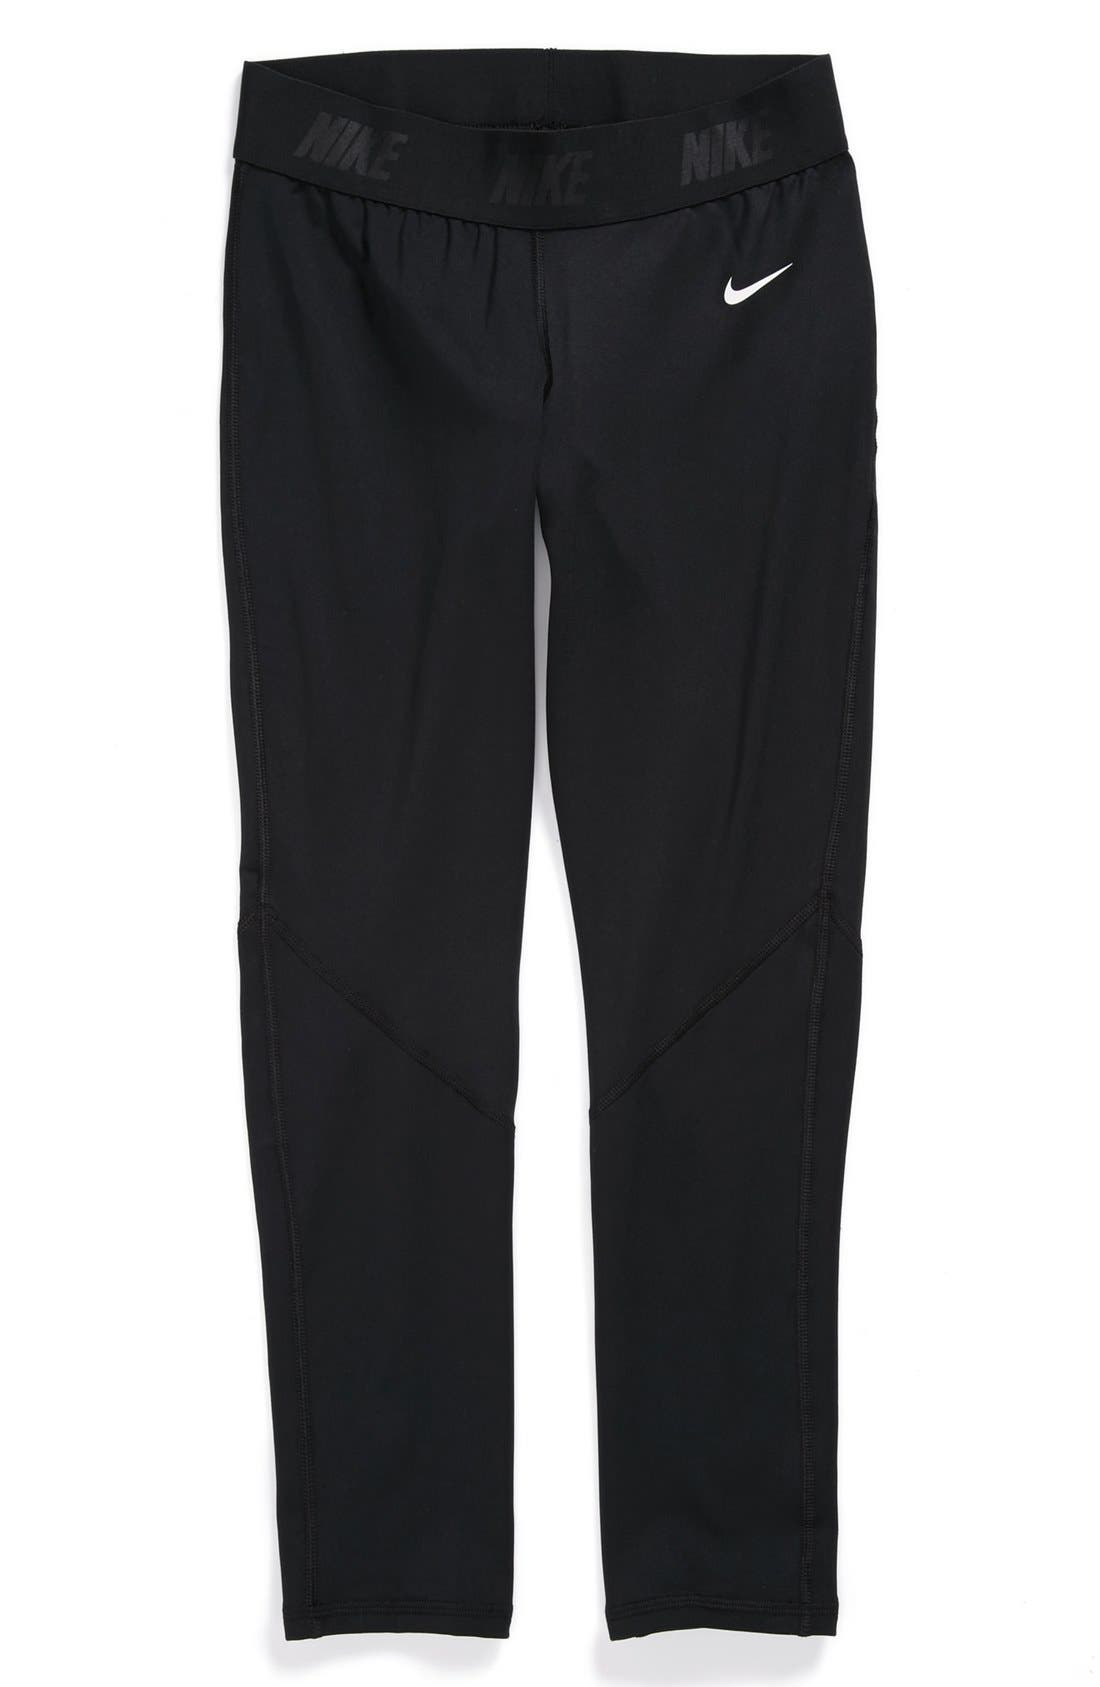 Alternate Image 1 Selected - Nike 'Pro' Leggings (Big Girls)